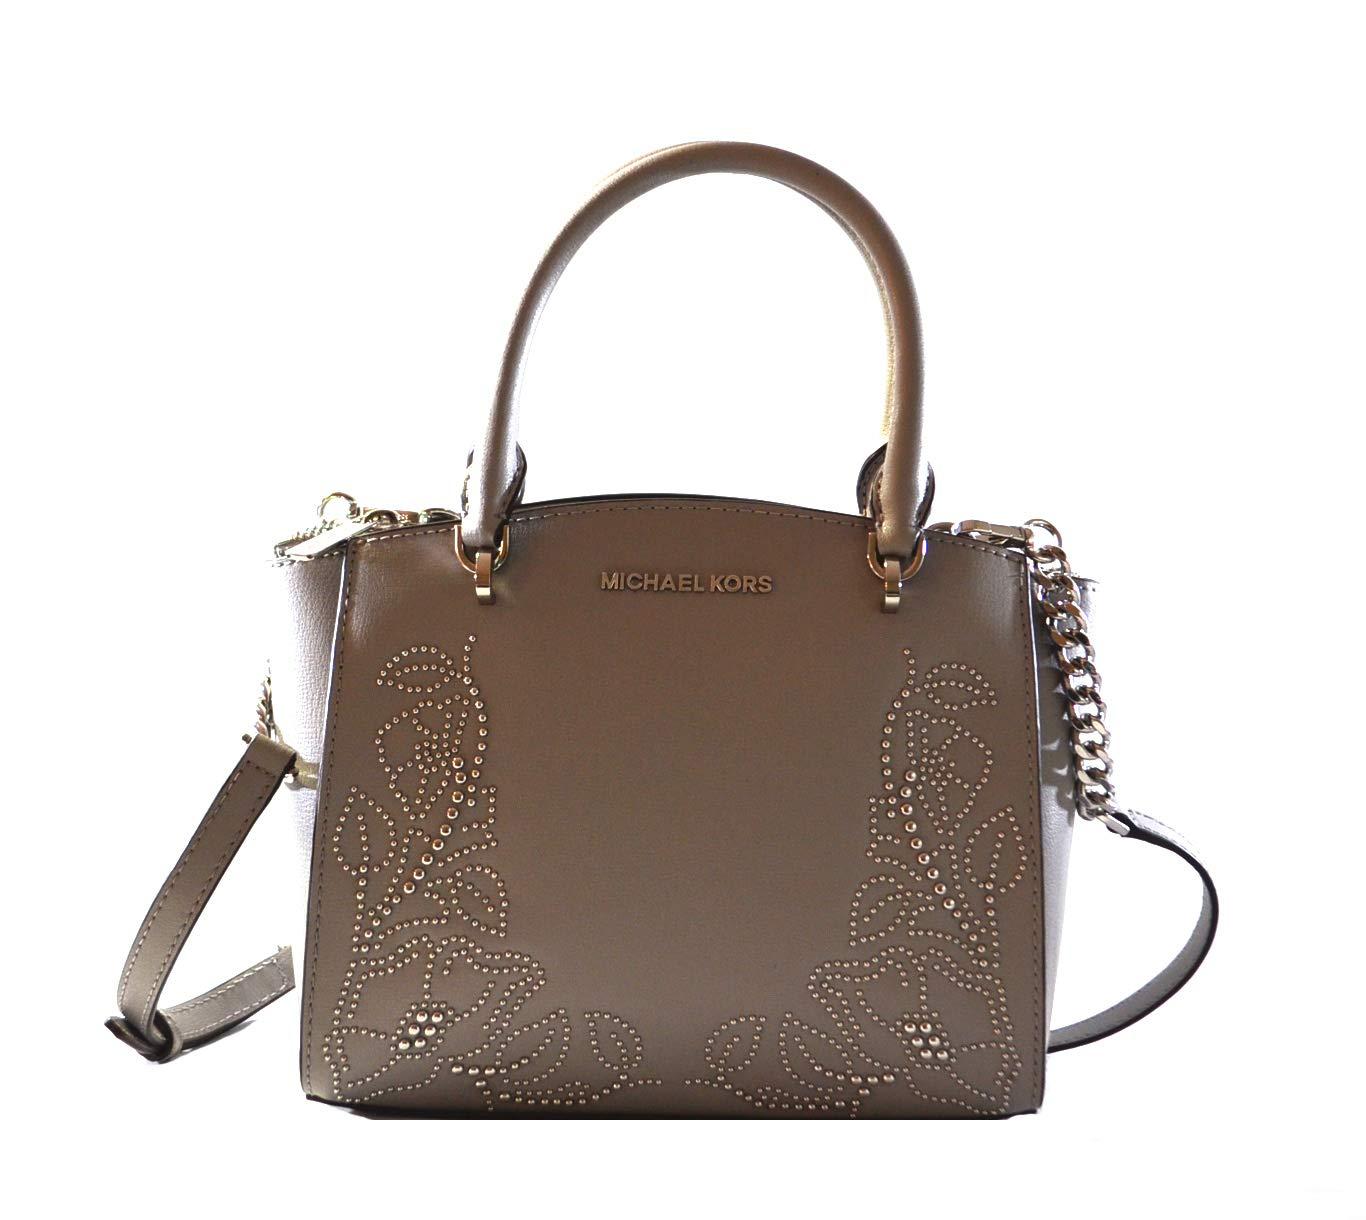 Michael Kors Women's Ellis Small Convertible Leather Gold Toned Studs Satchel Crossbody Bag Purse Handbag (Ash Grey)